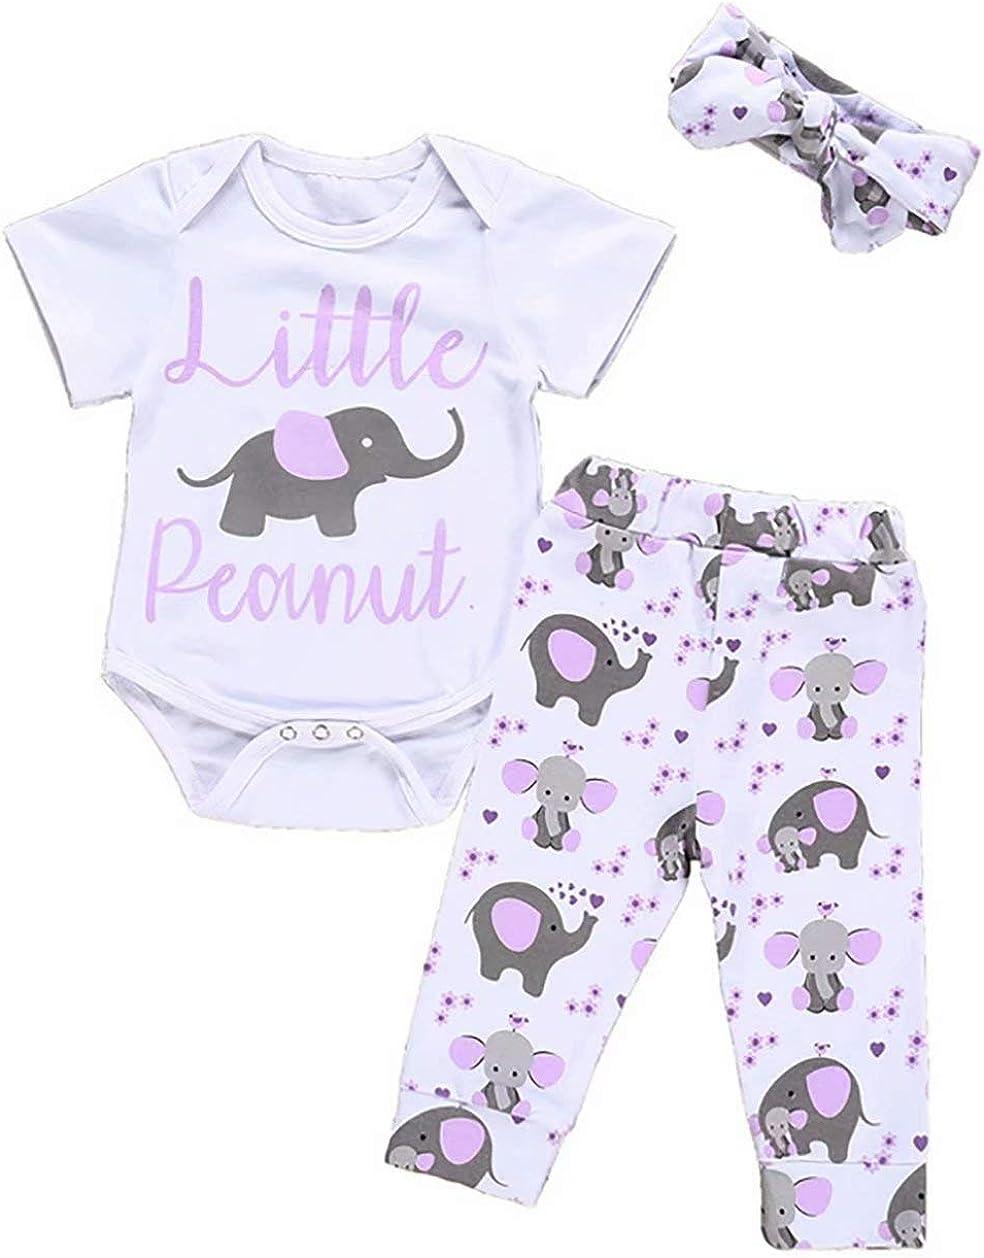 Newborn Baby Girl Boy Little Peanut Romper Set Cartoon Elephant Love Heart Long Sleeve Romper + Pants + Hat Outfit Sets